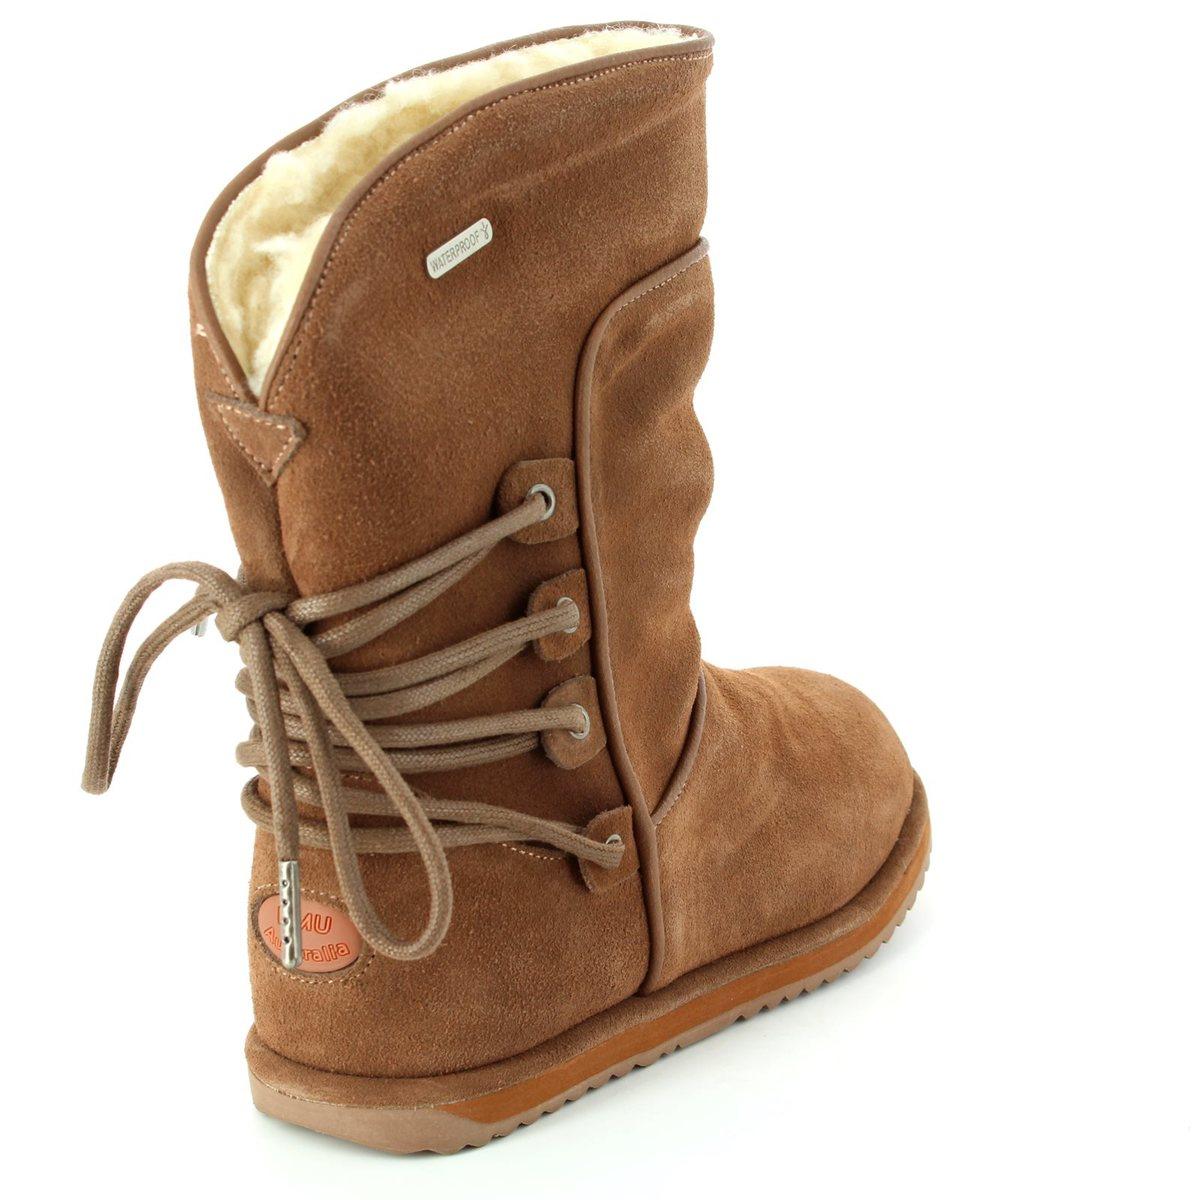 803a2451f77 EMU Australia Boots - Tan suede - K11309 10 ISLAY KIDS